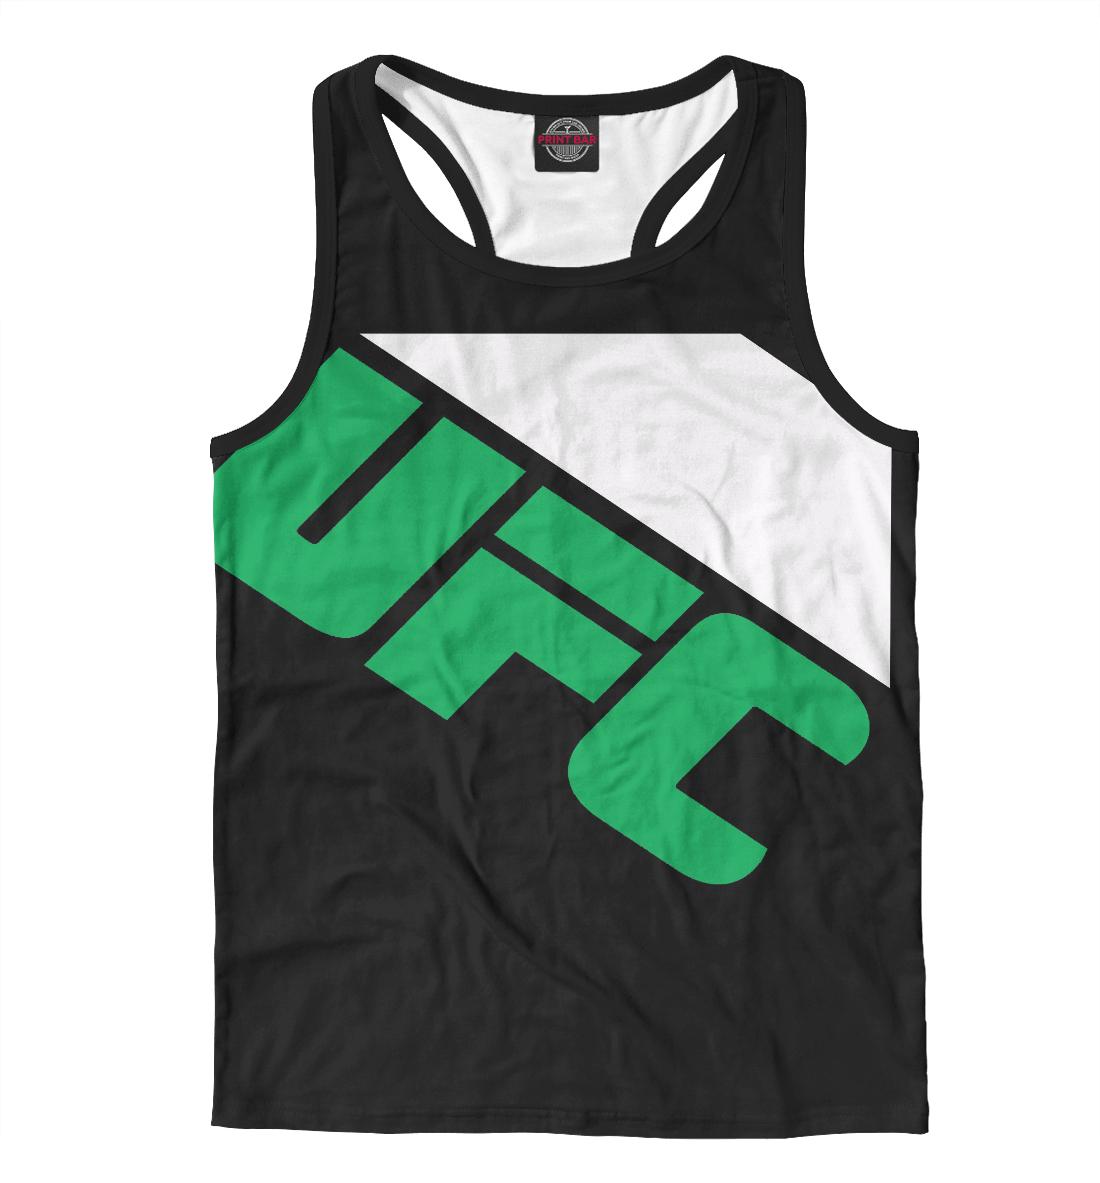 Купить Конор МакГрегор UFC, Printbar, Майки борцовки, MCG-547734-mayb-2